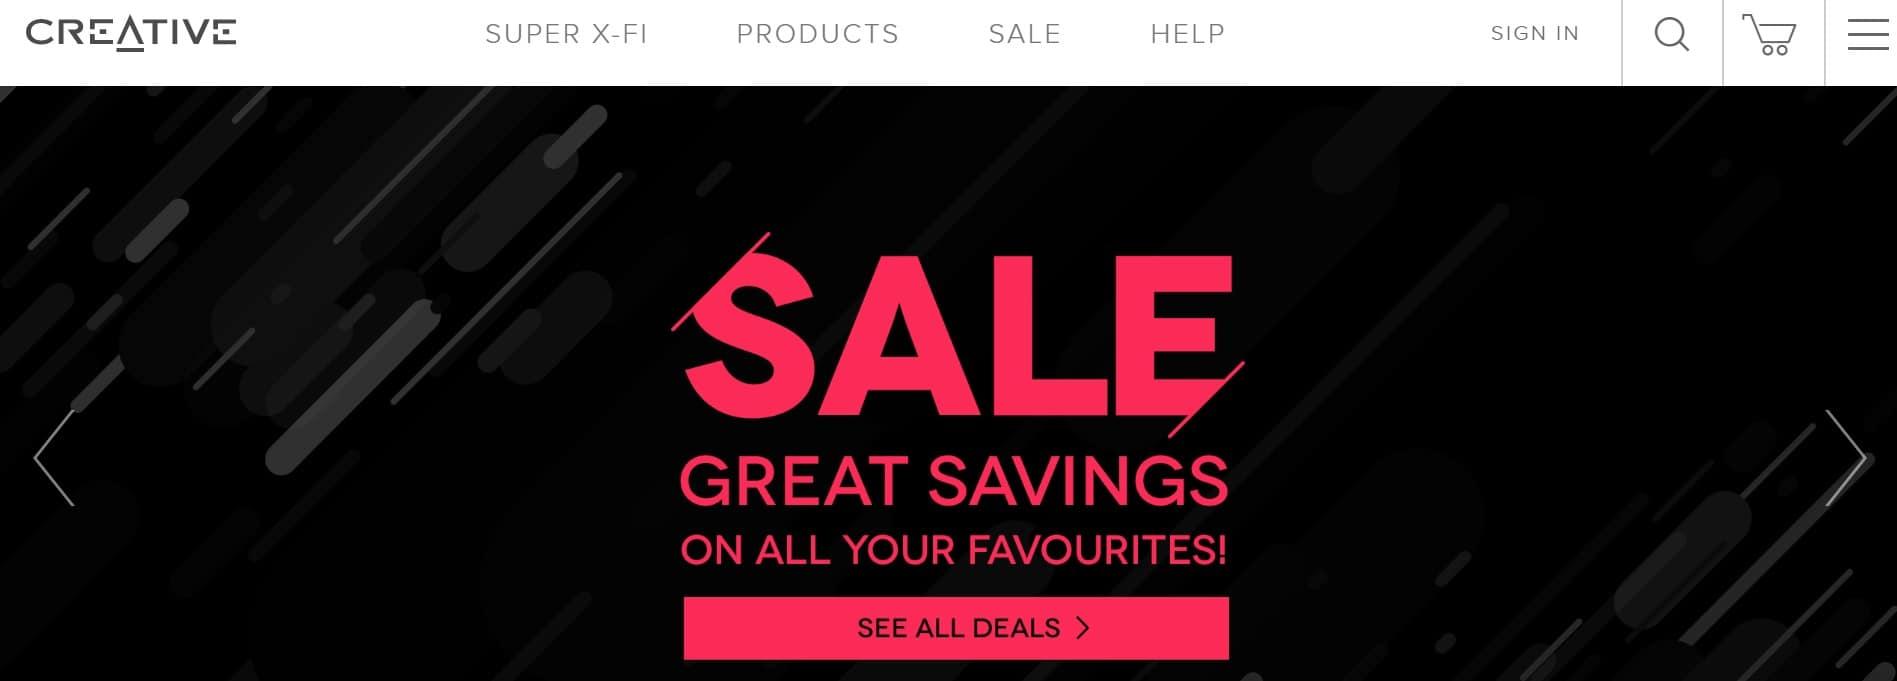 Creative Sale